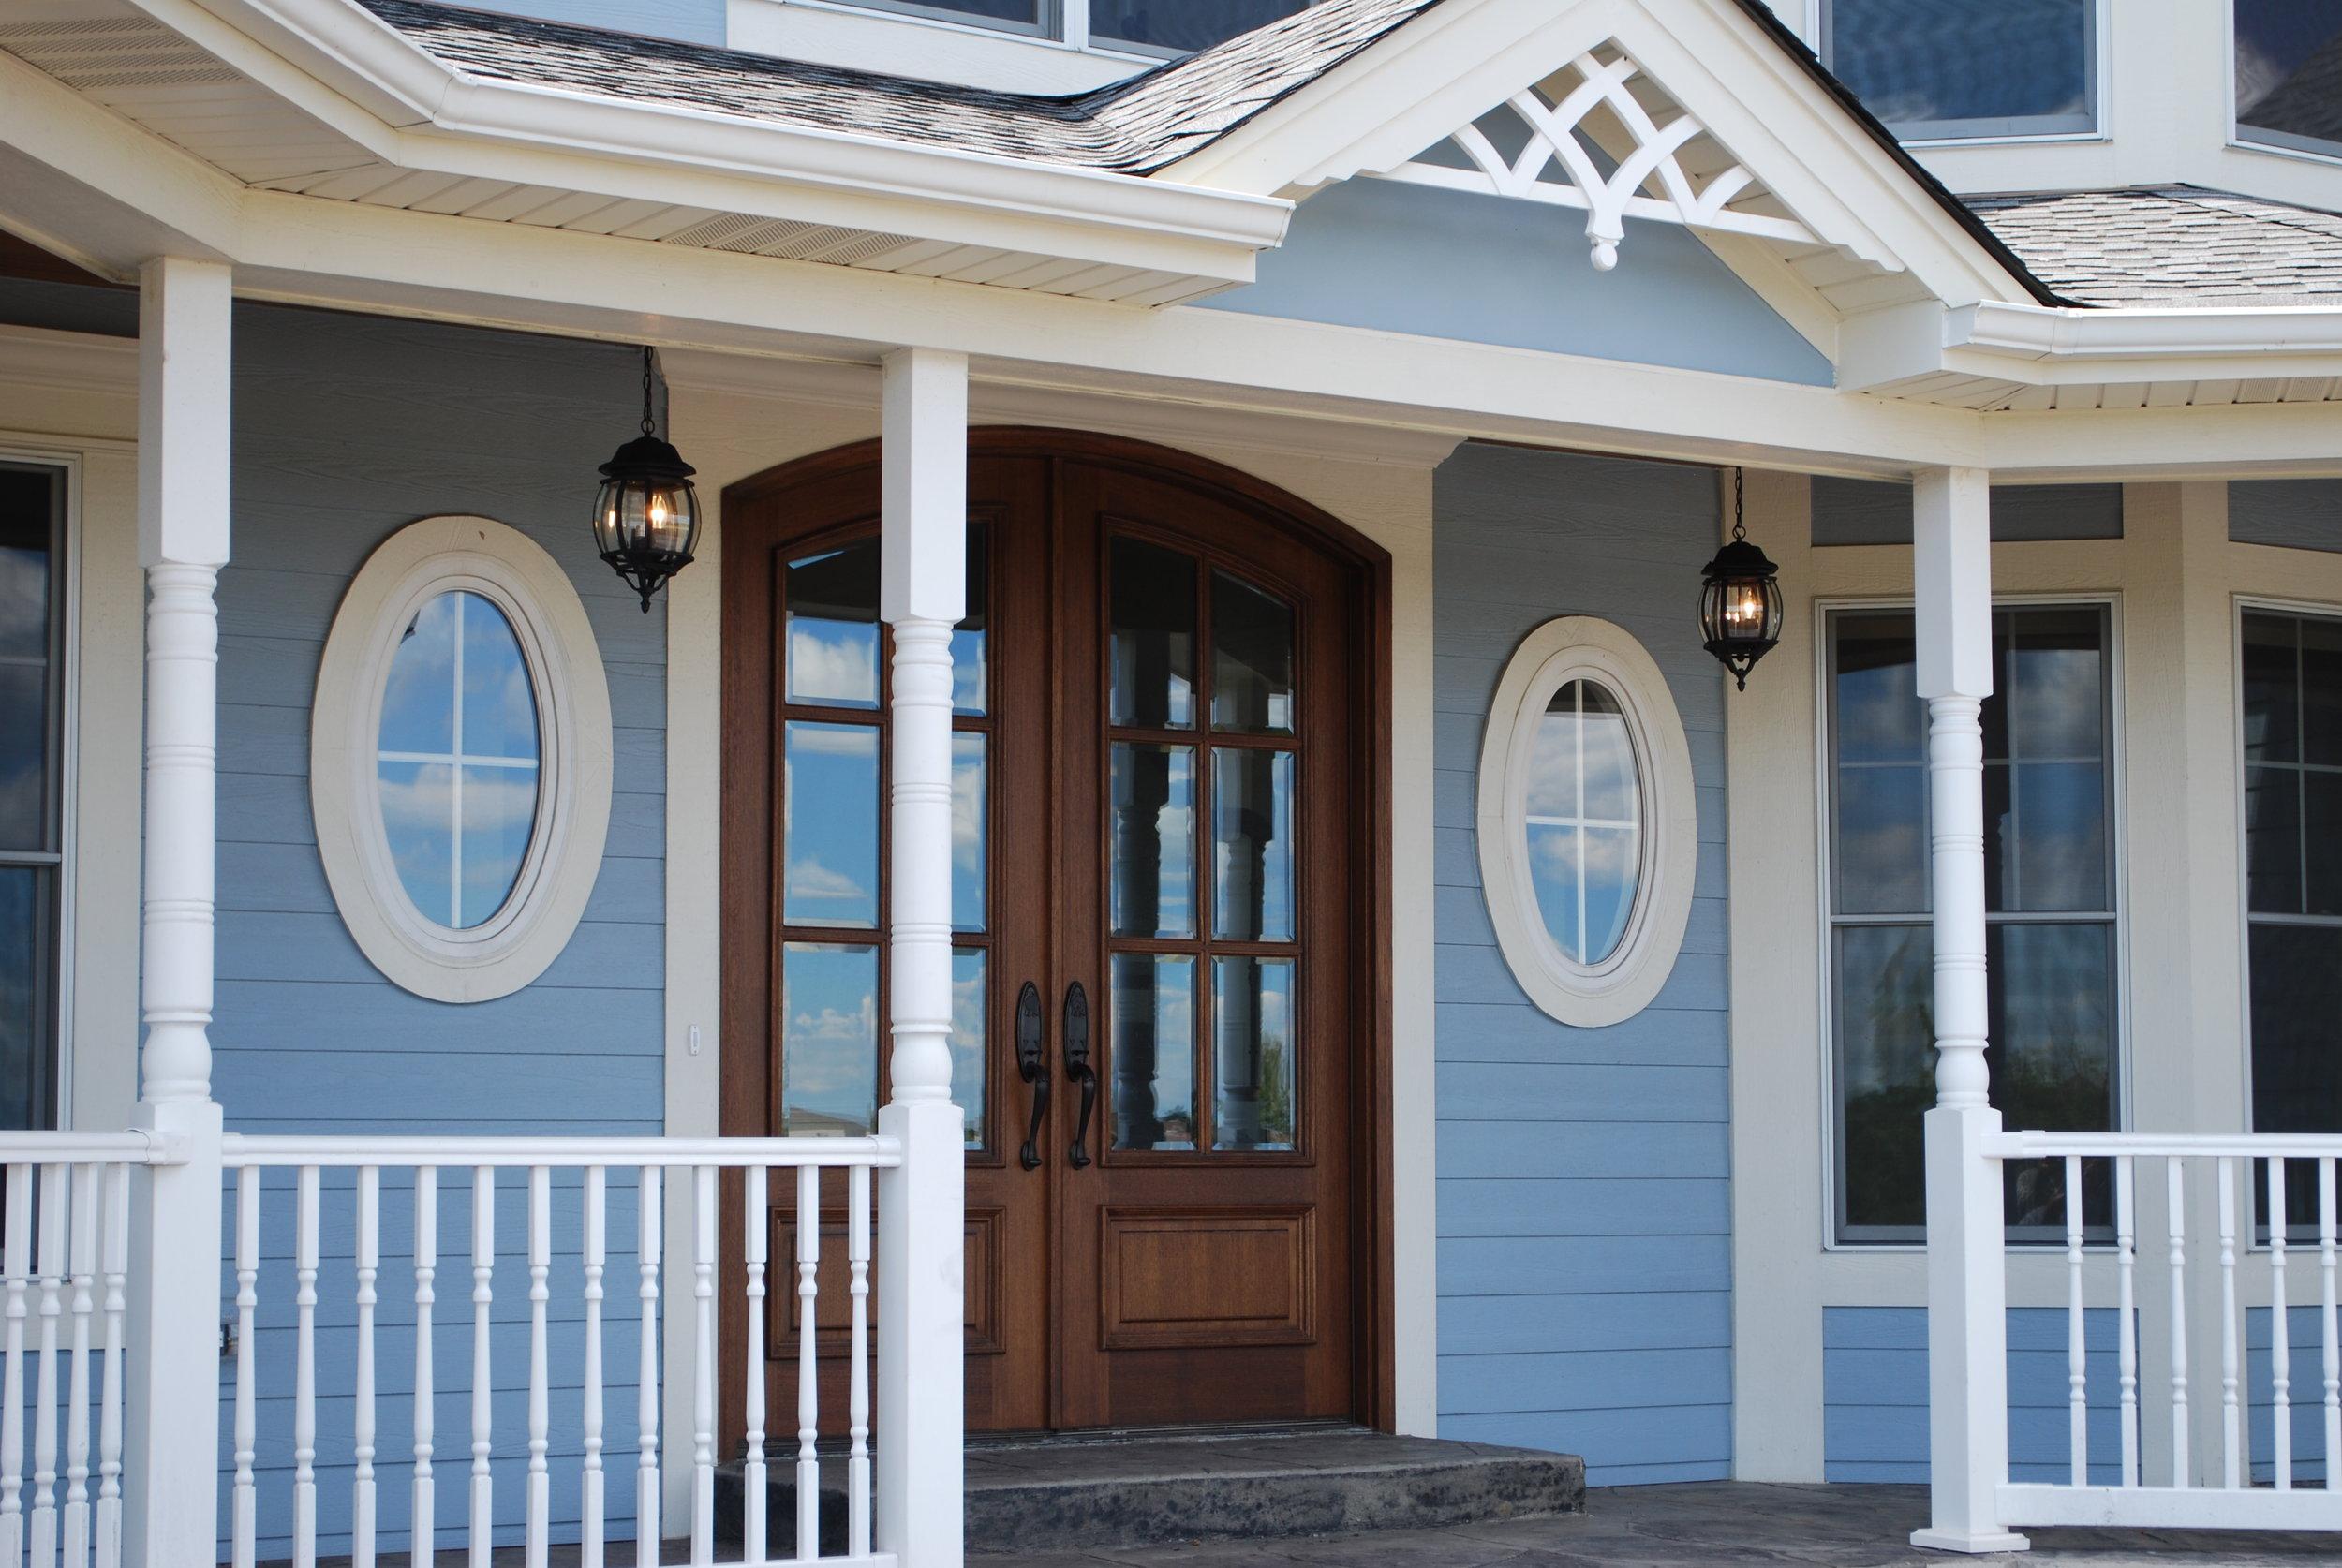 Custom Entrance Front Porch by Southampton Builders LLC.